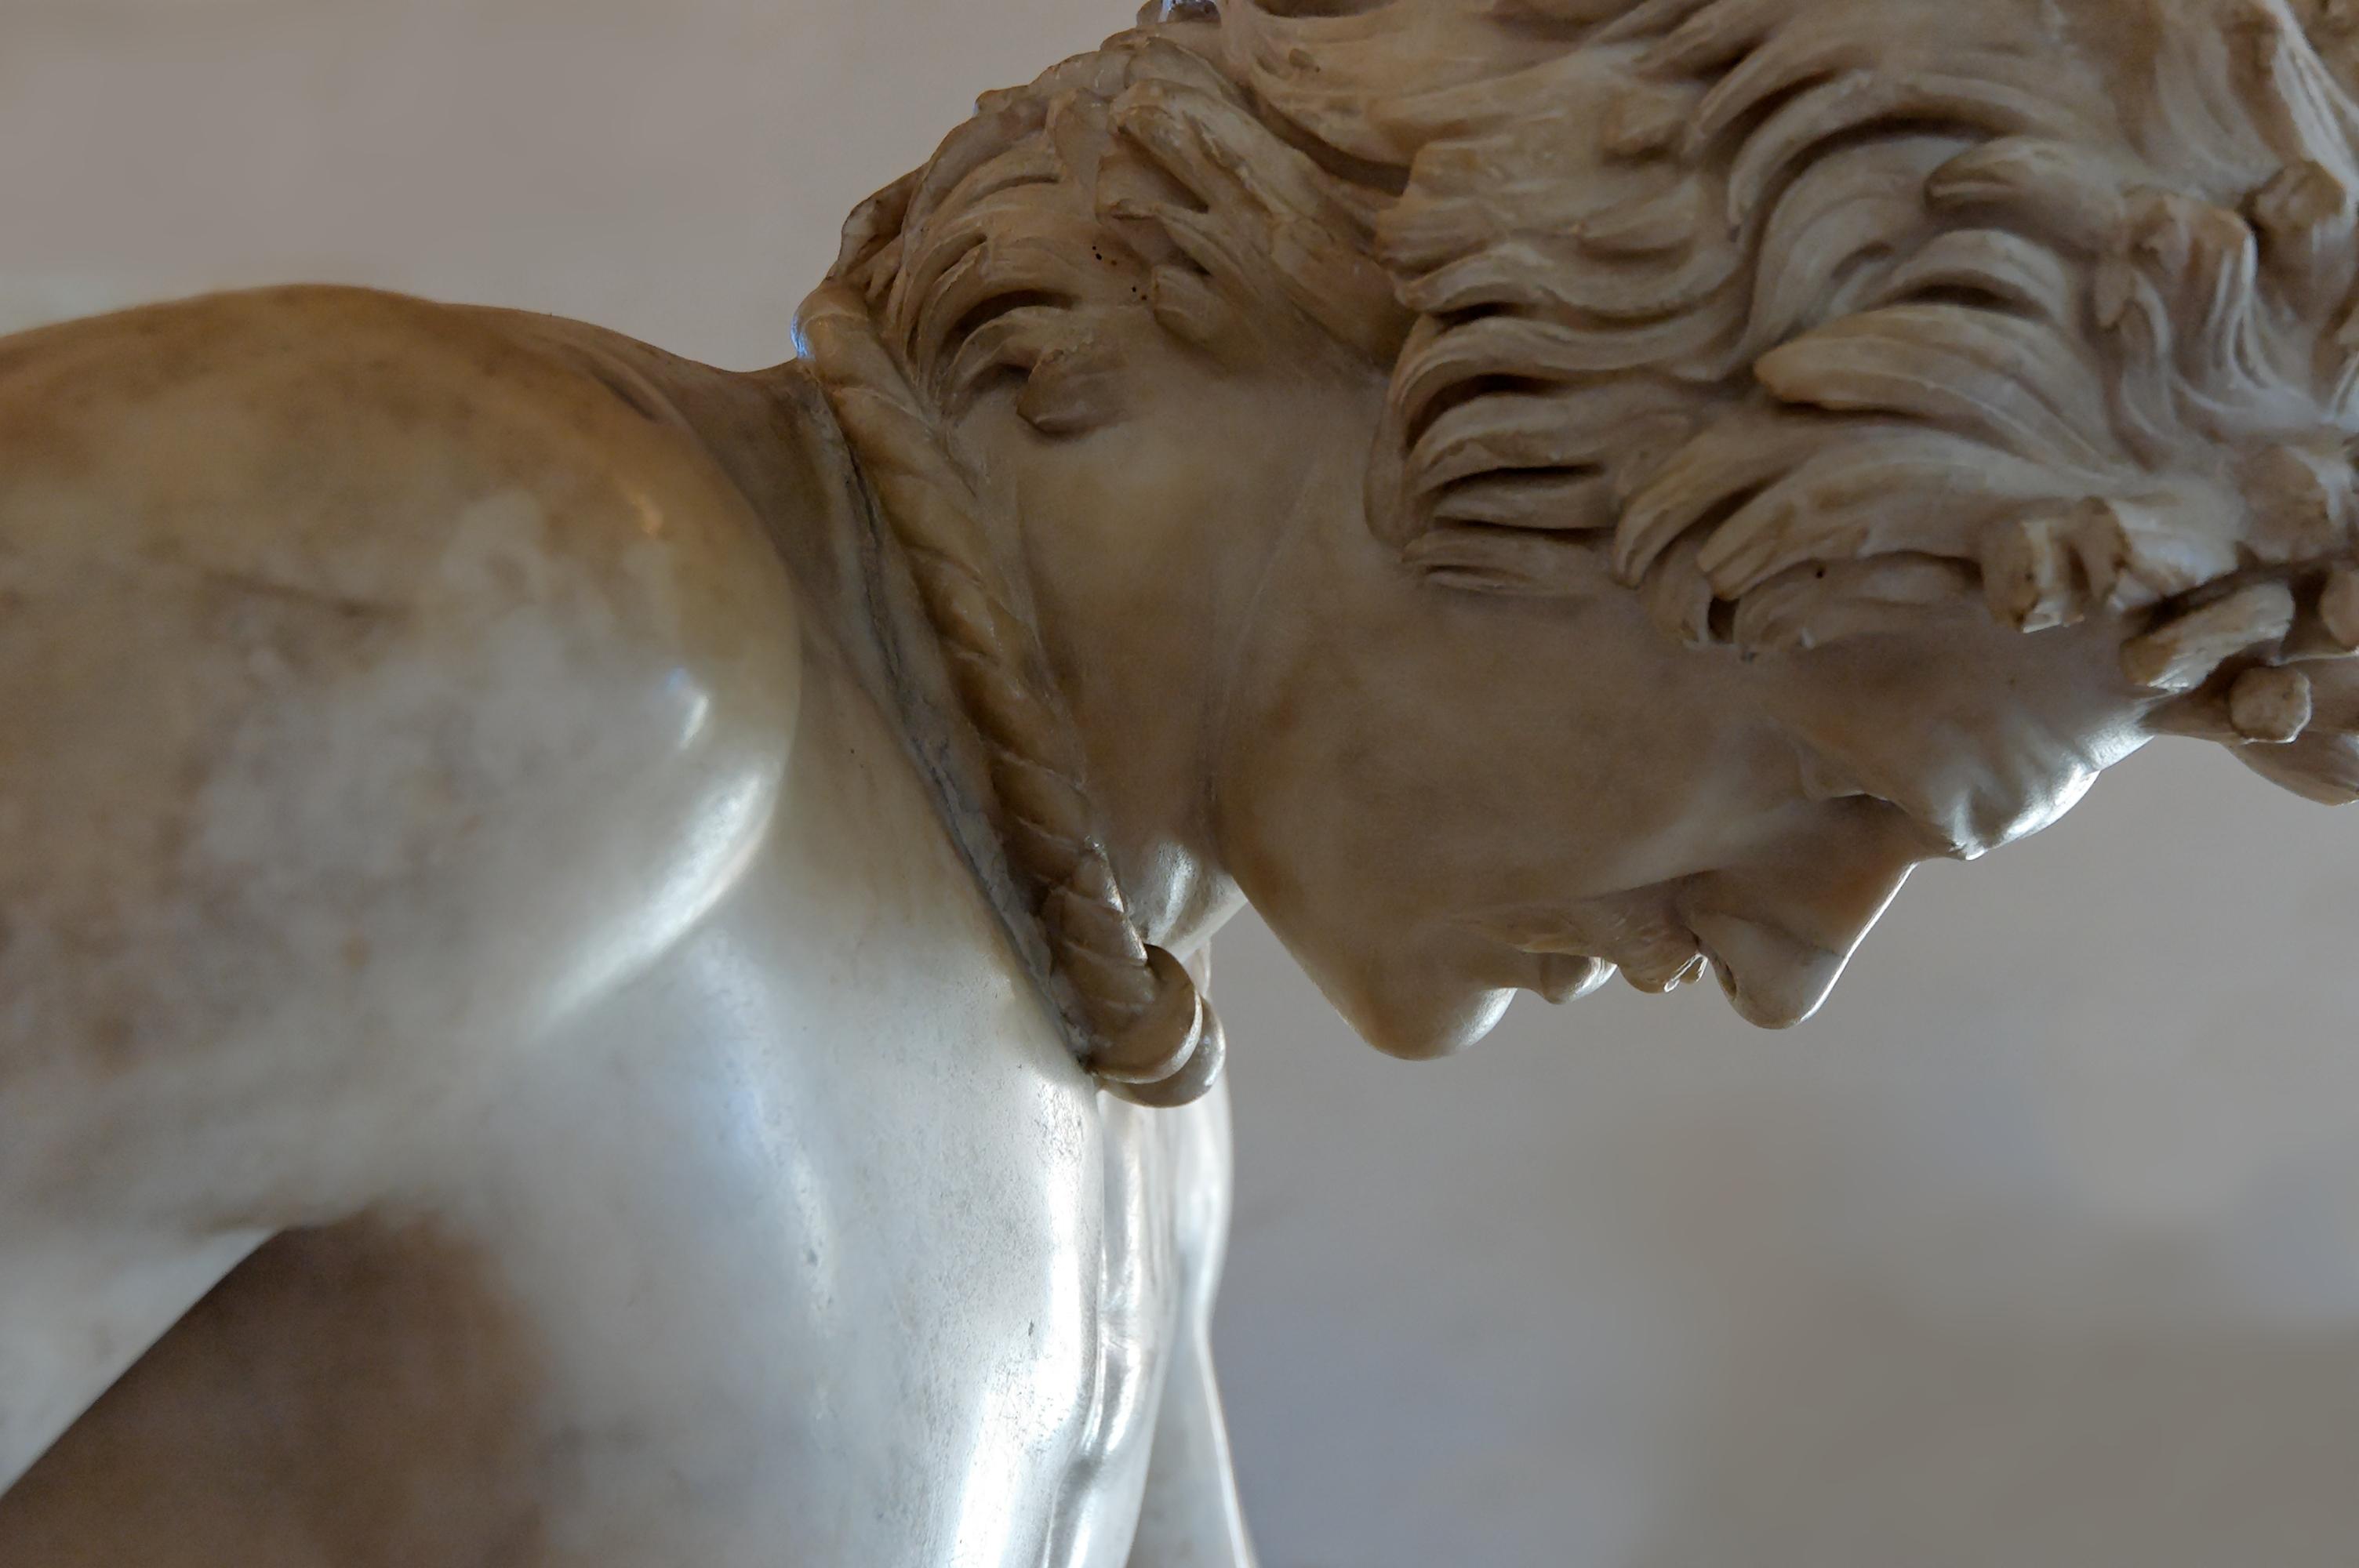 Dying Gaul Musei Capitolini MC747.jpg